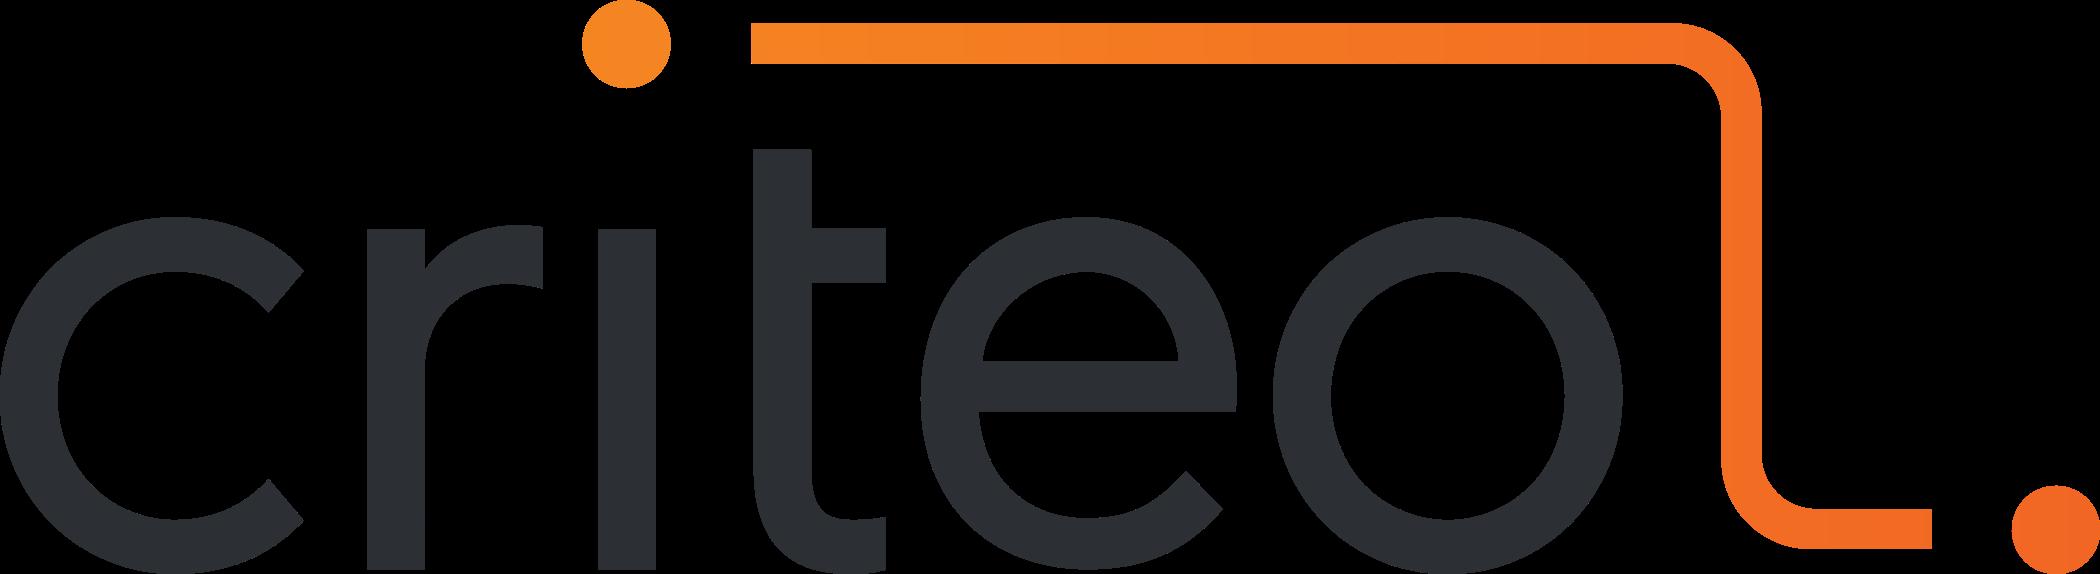 criteo logo 1 - Criteo Logo